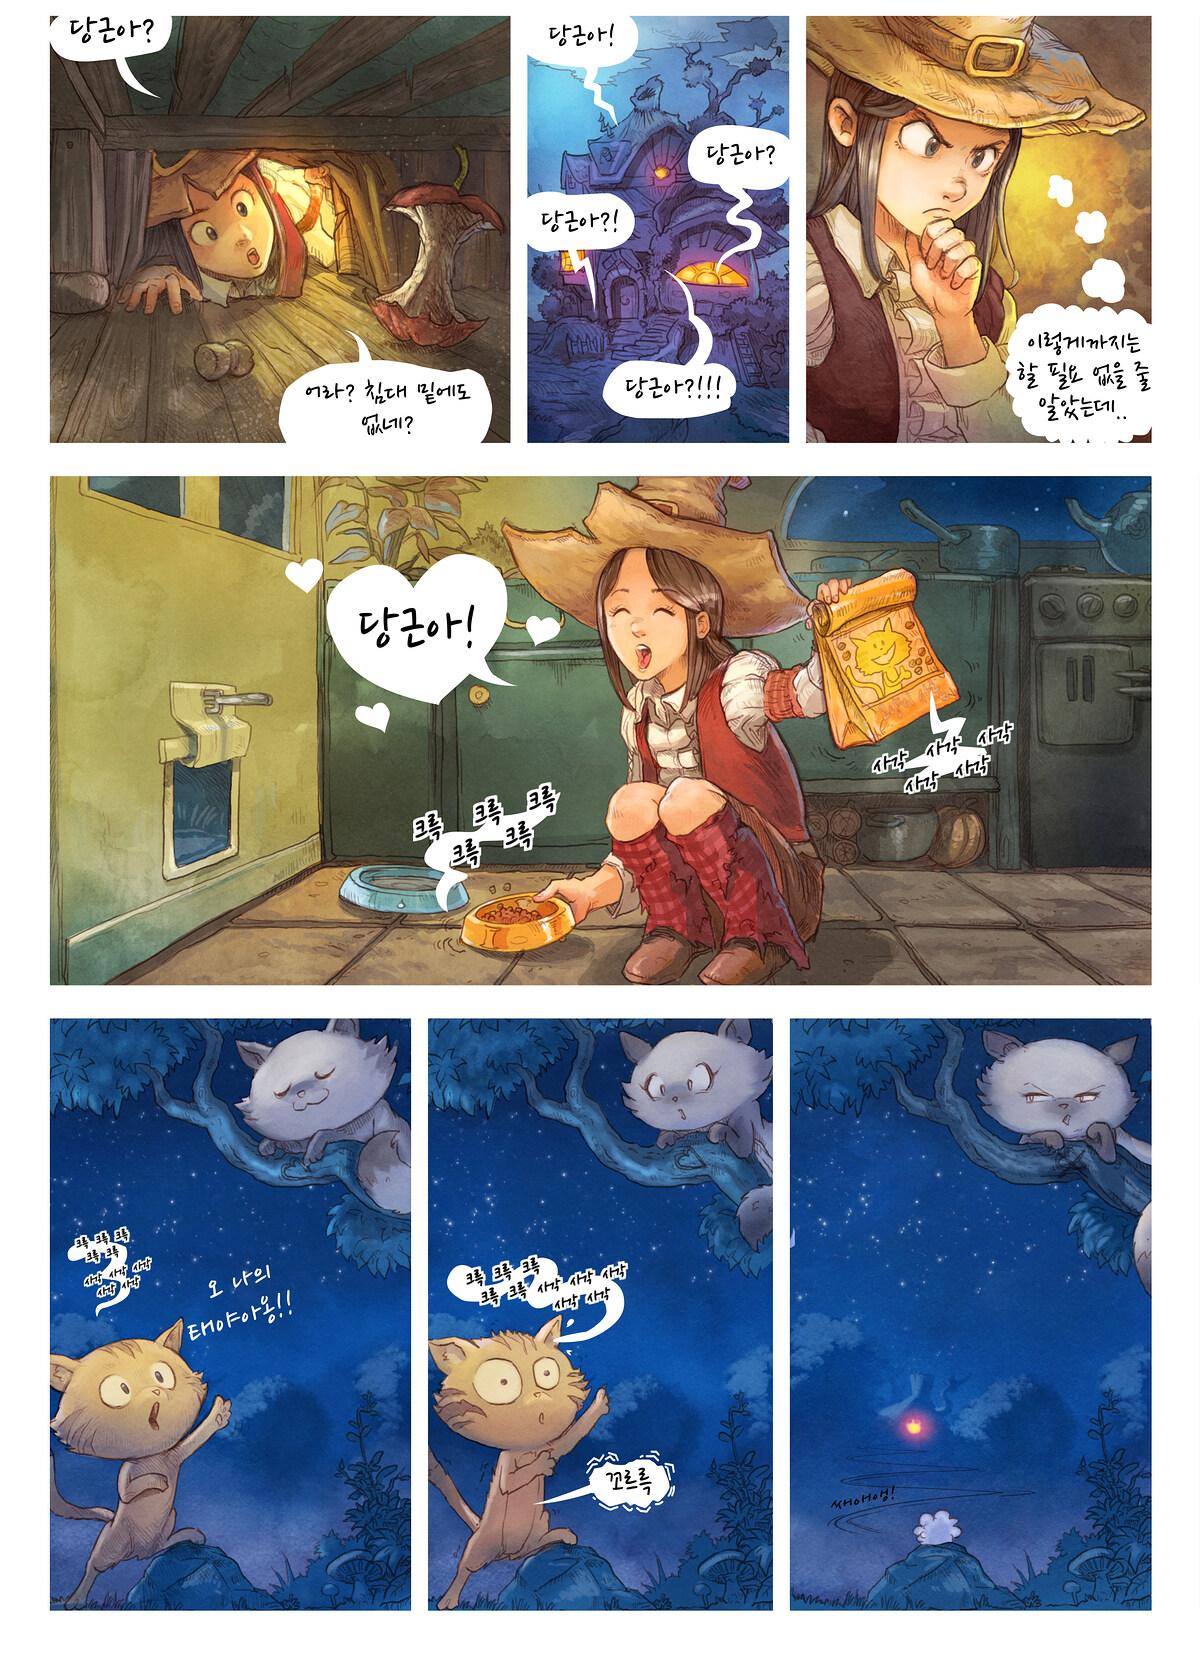 A webcomic page of Pepper&Carrot, 에피소드 4 [kr], 페이지 2